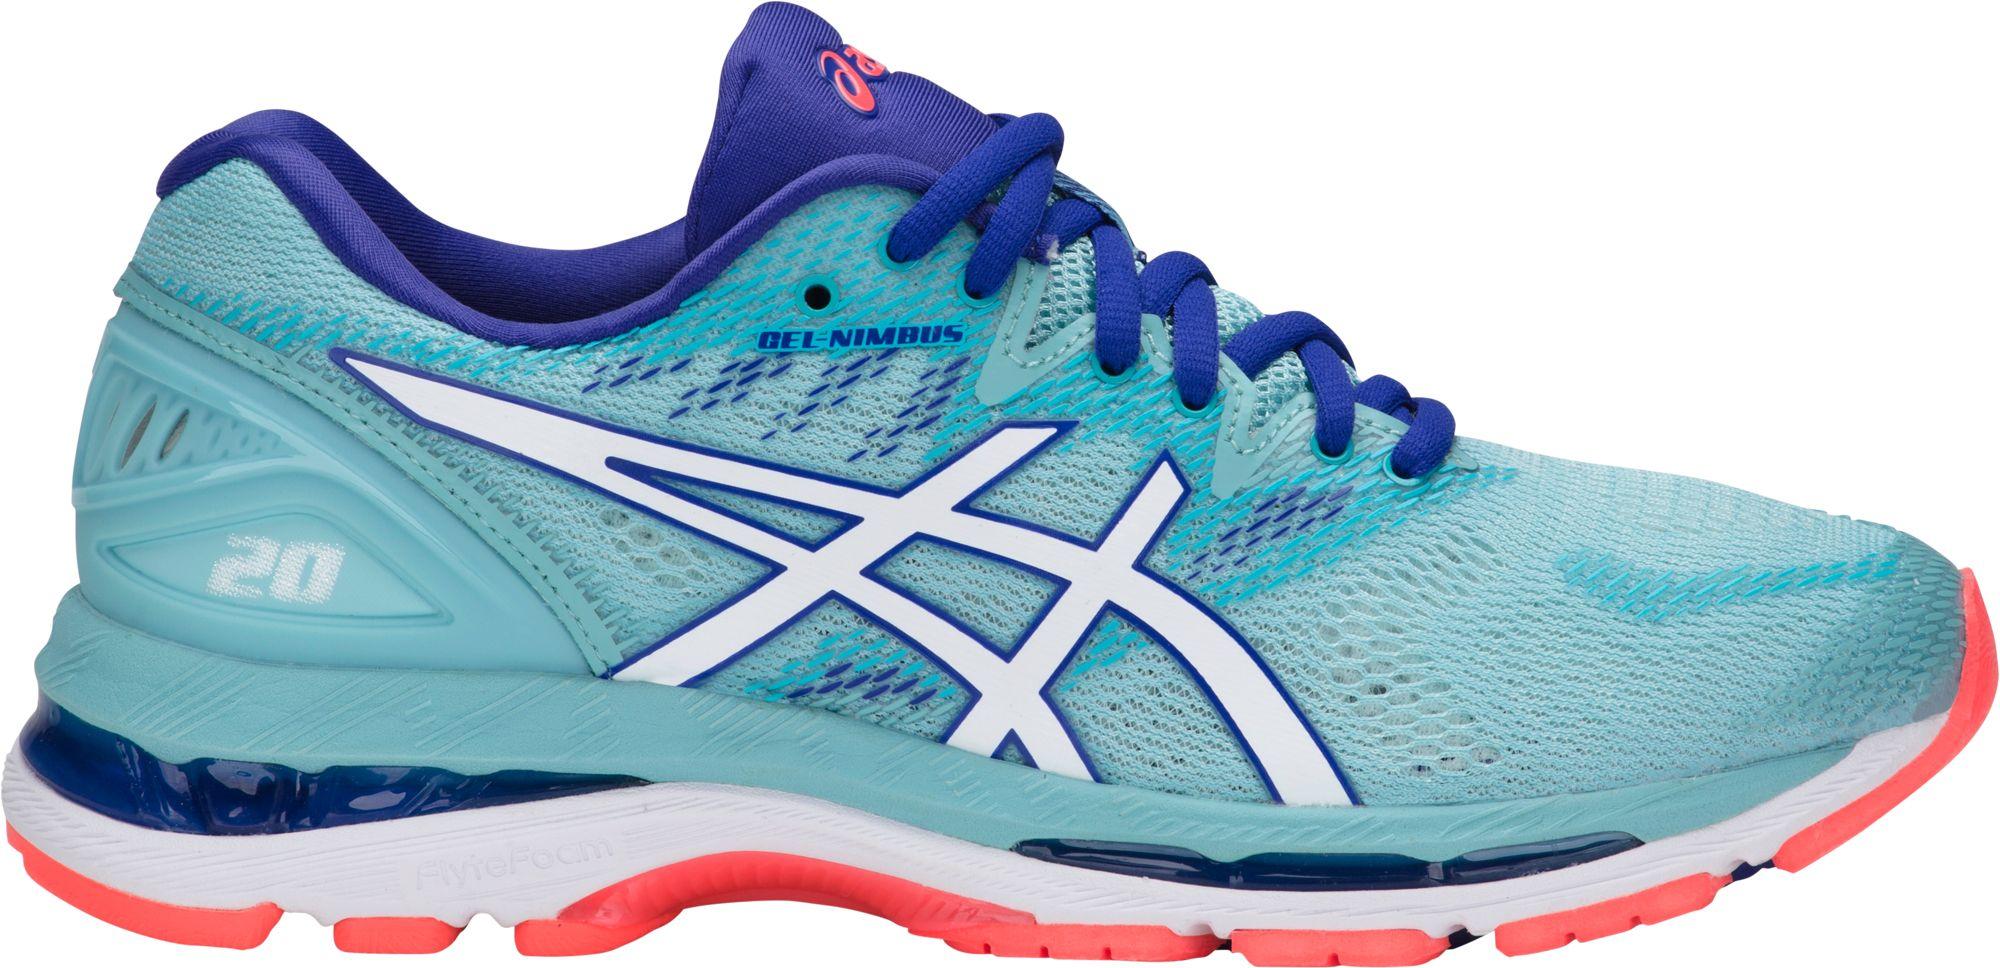 900901d7a9def ASICS Women's GEL-Nimbus 20 Running Shoes | DICK'S Sporting ...